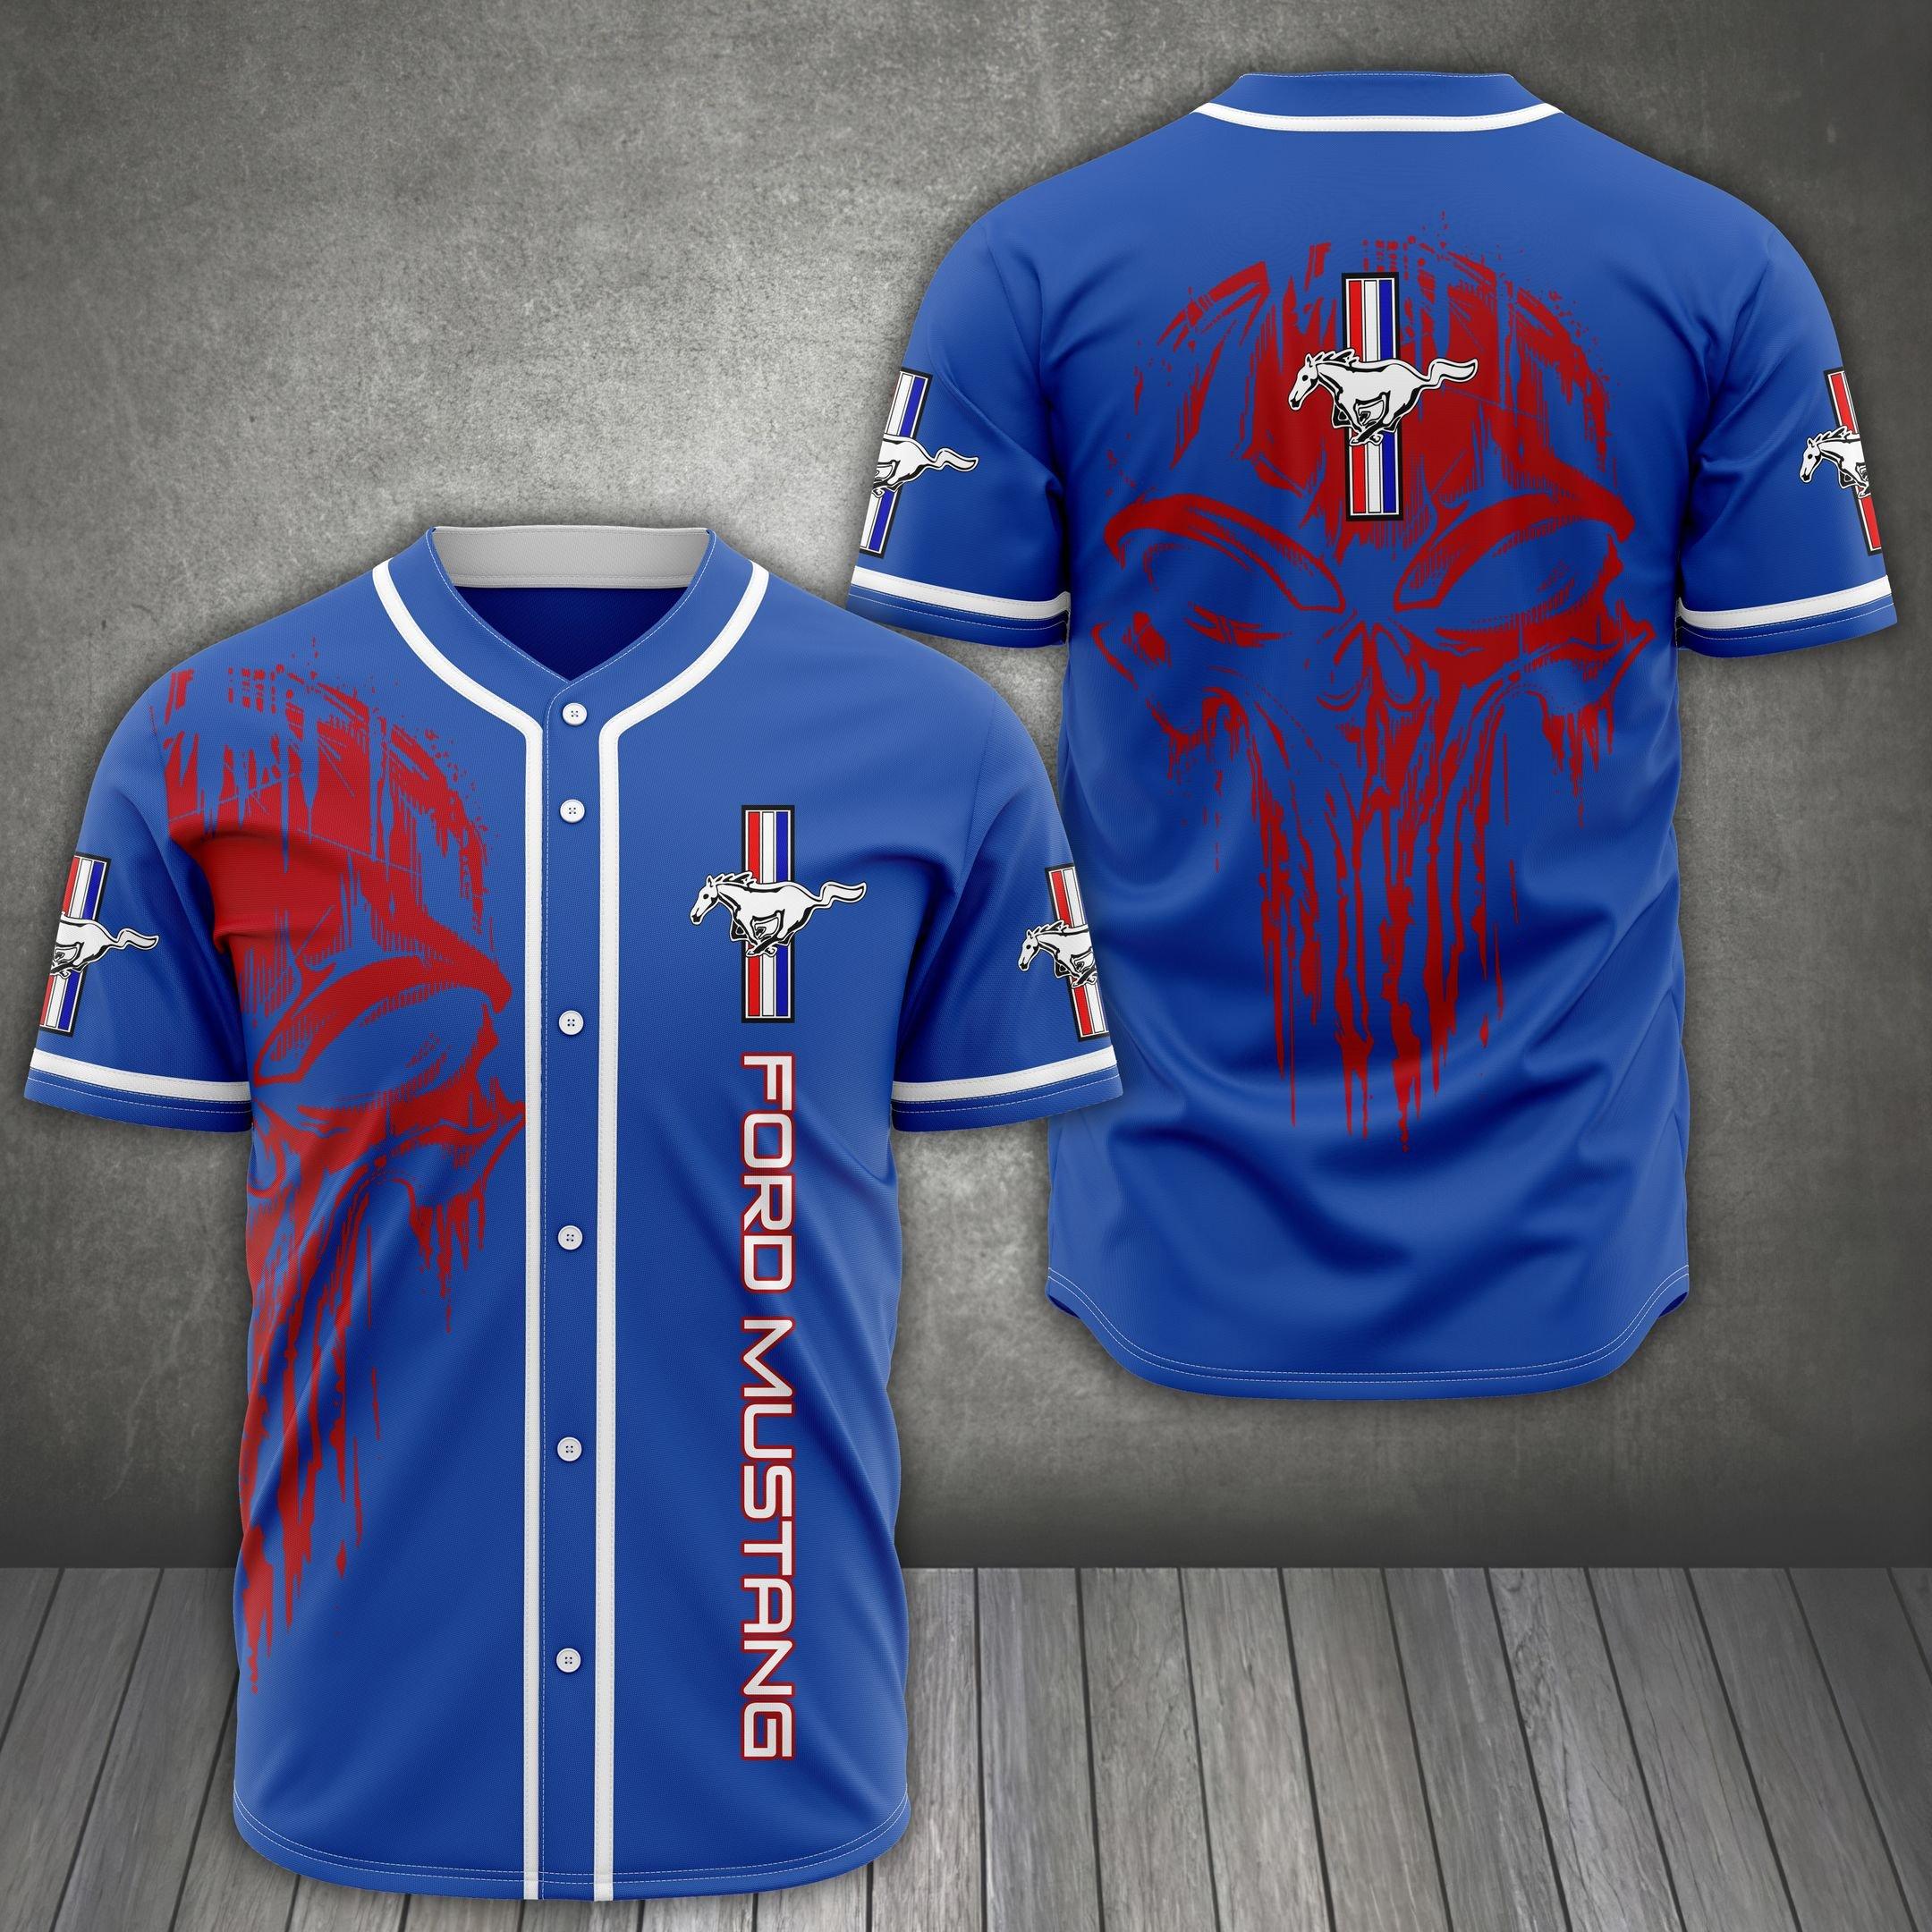 FORD MUSTANG red skull bule baseball Jersey shirt